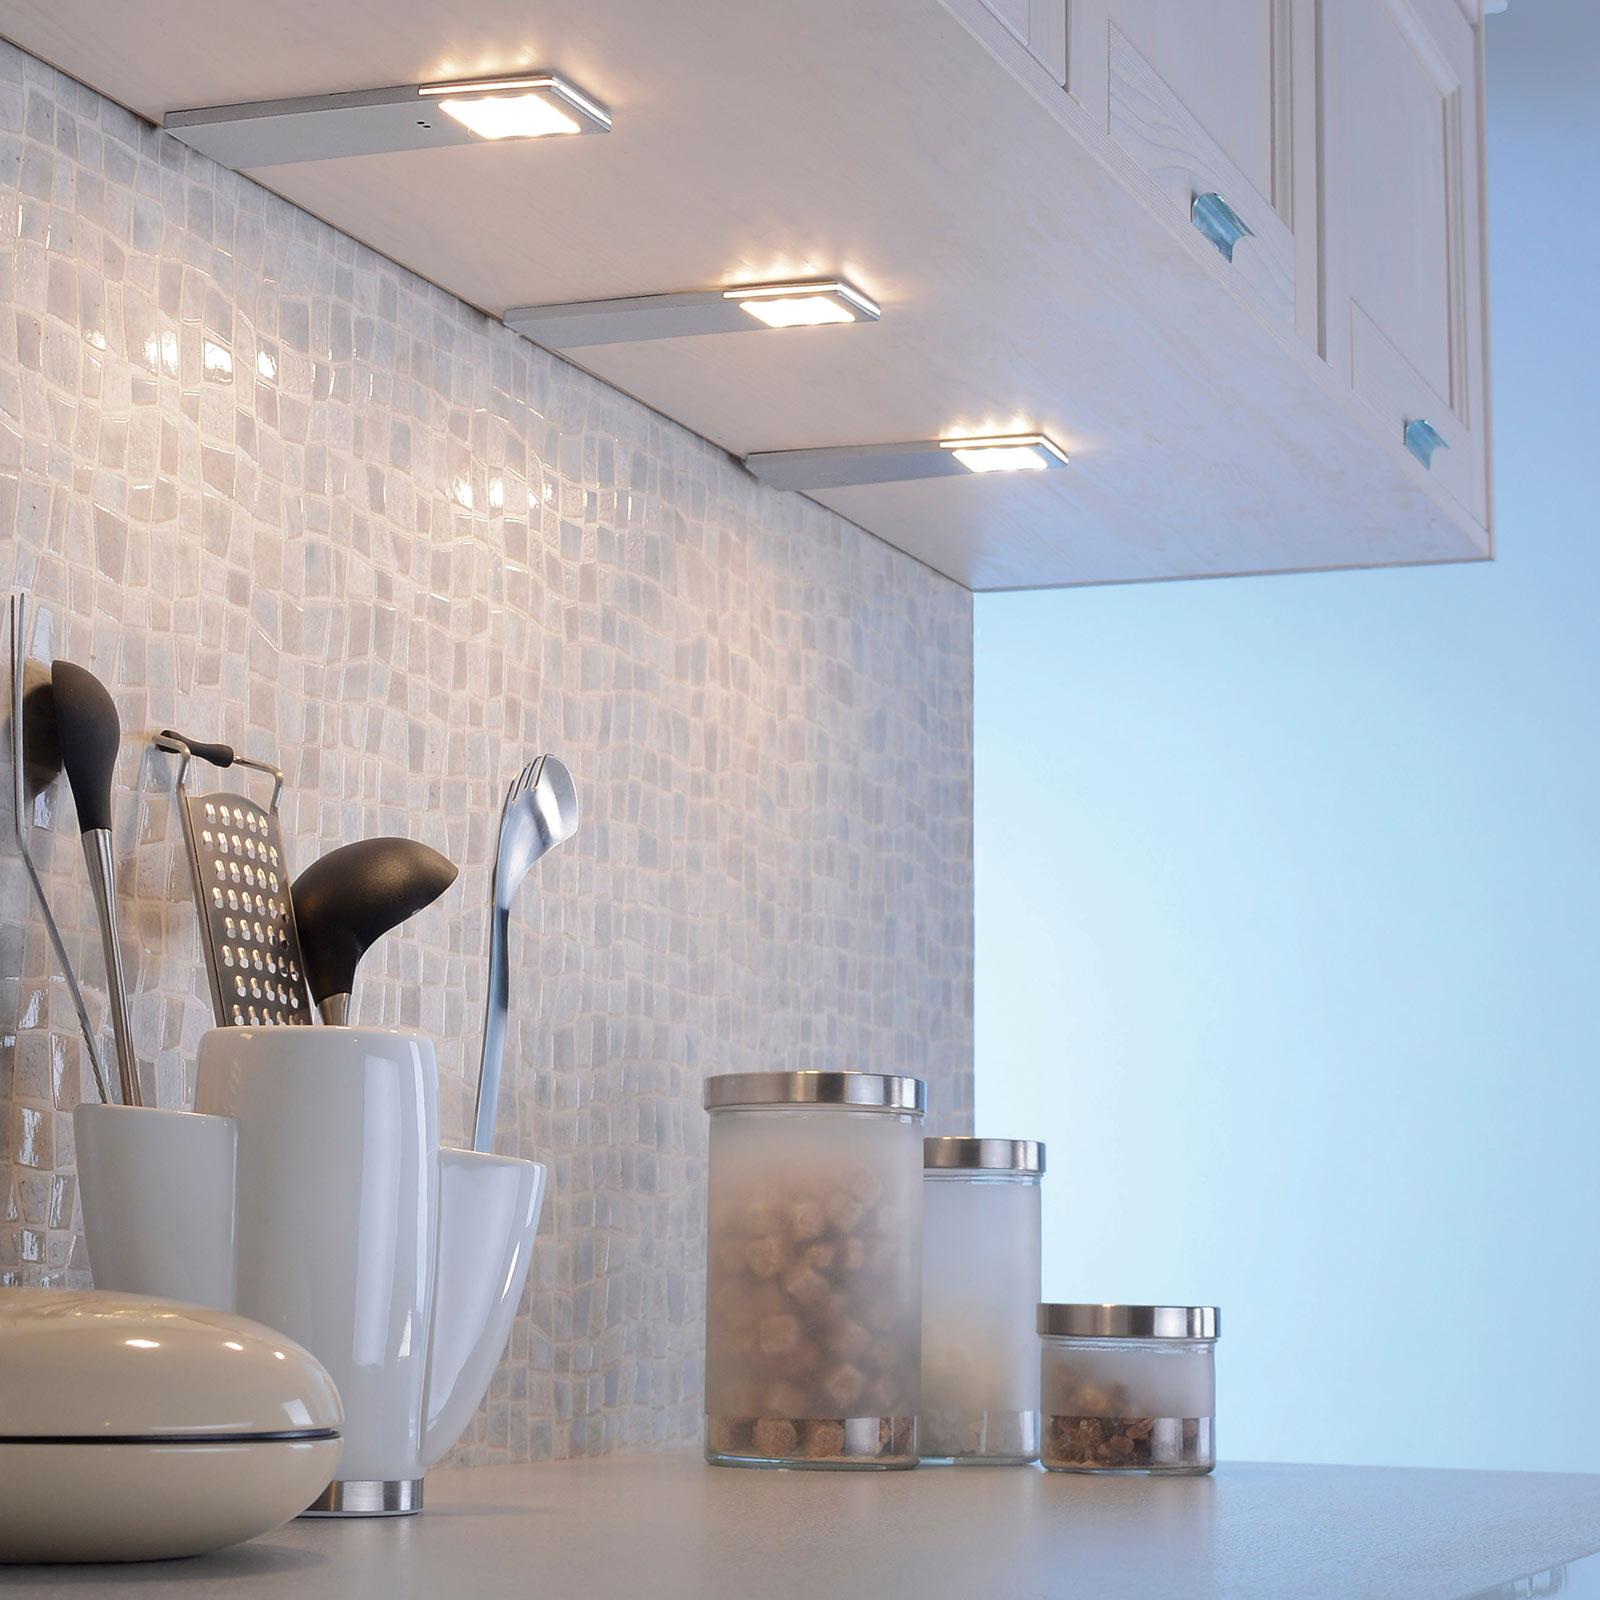 Acquista Lampada per mobili sensore LED Helena 6,6 cm 3pz